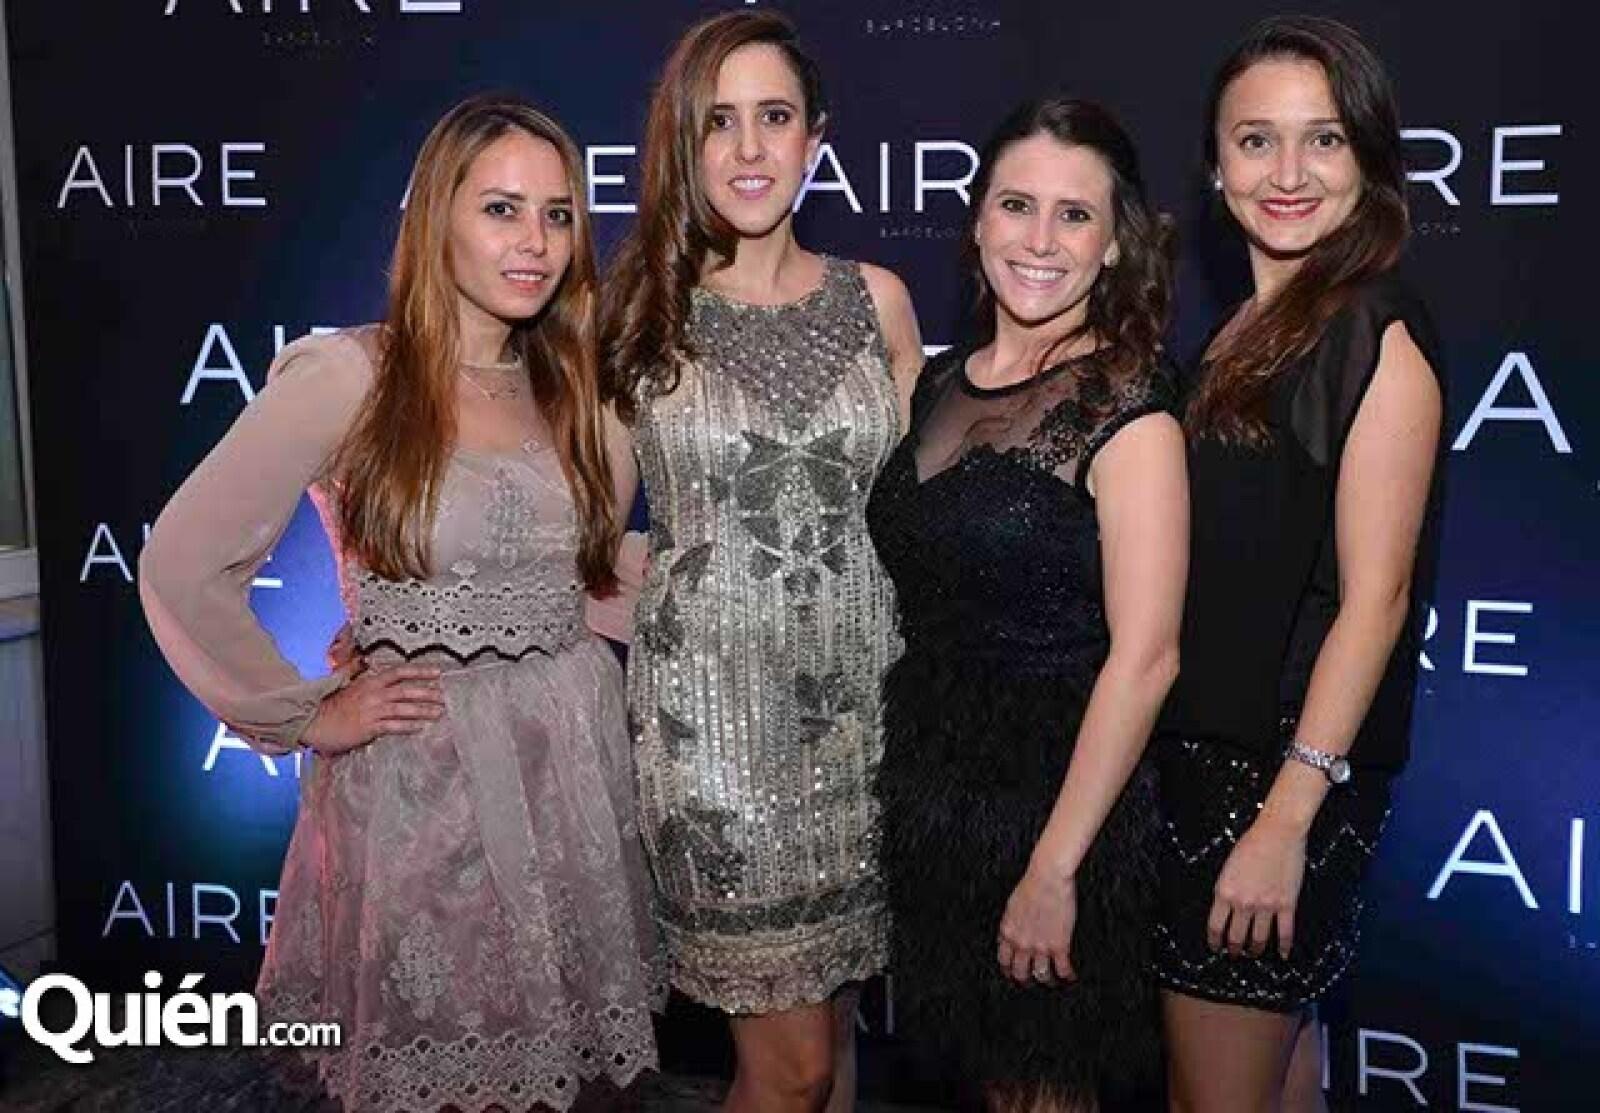 Gaby Rivas,Mariela Molina,Ana Laura,Capetillo y Andrea Díaz.